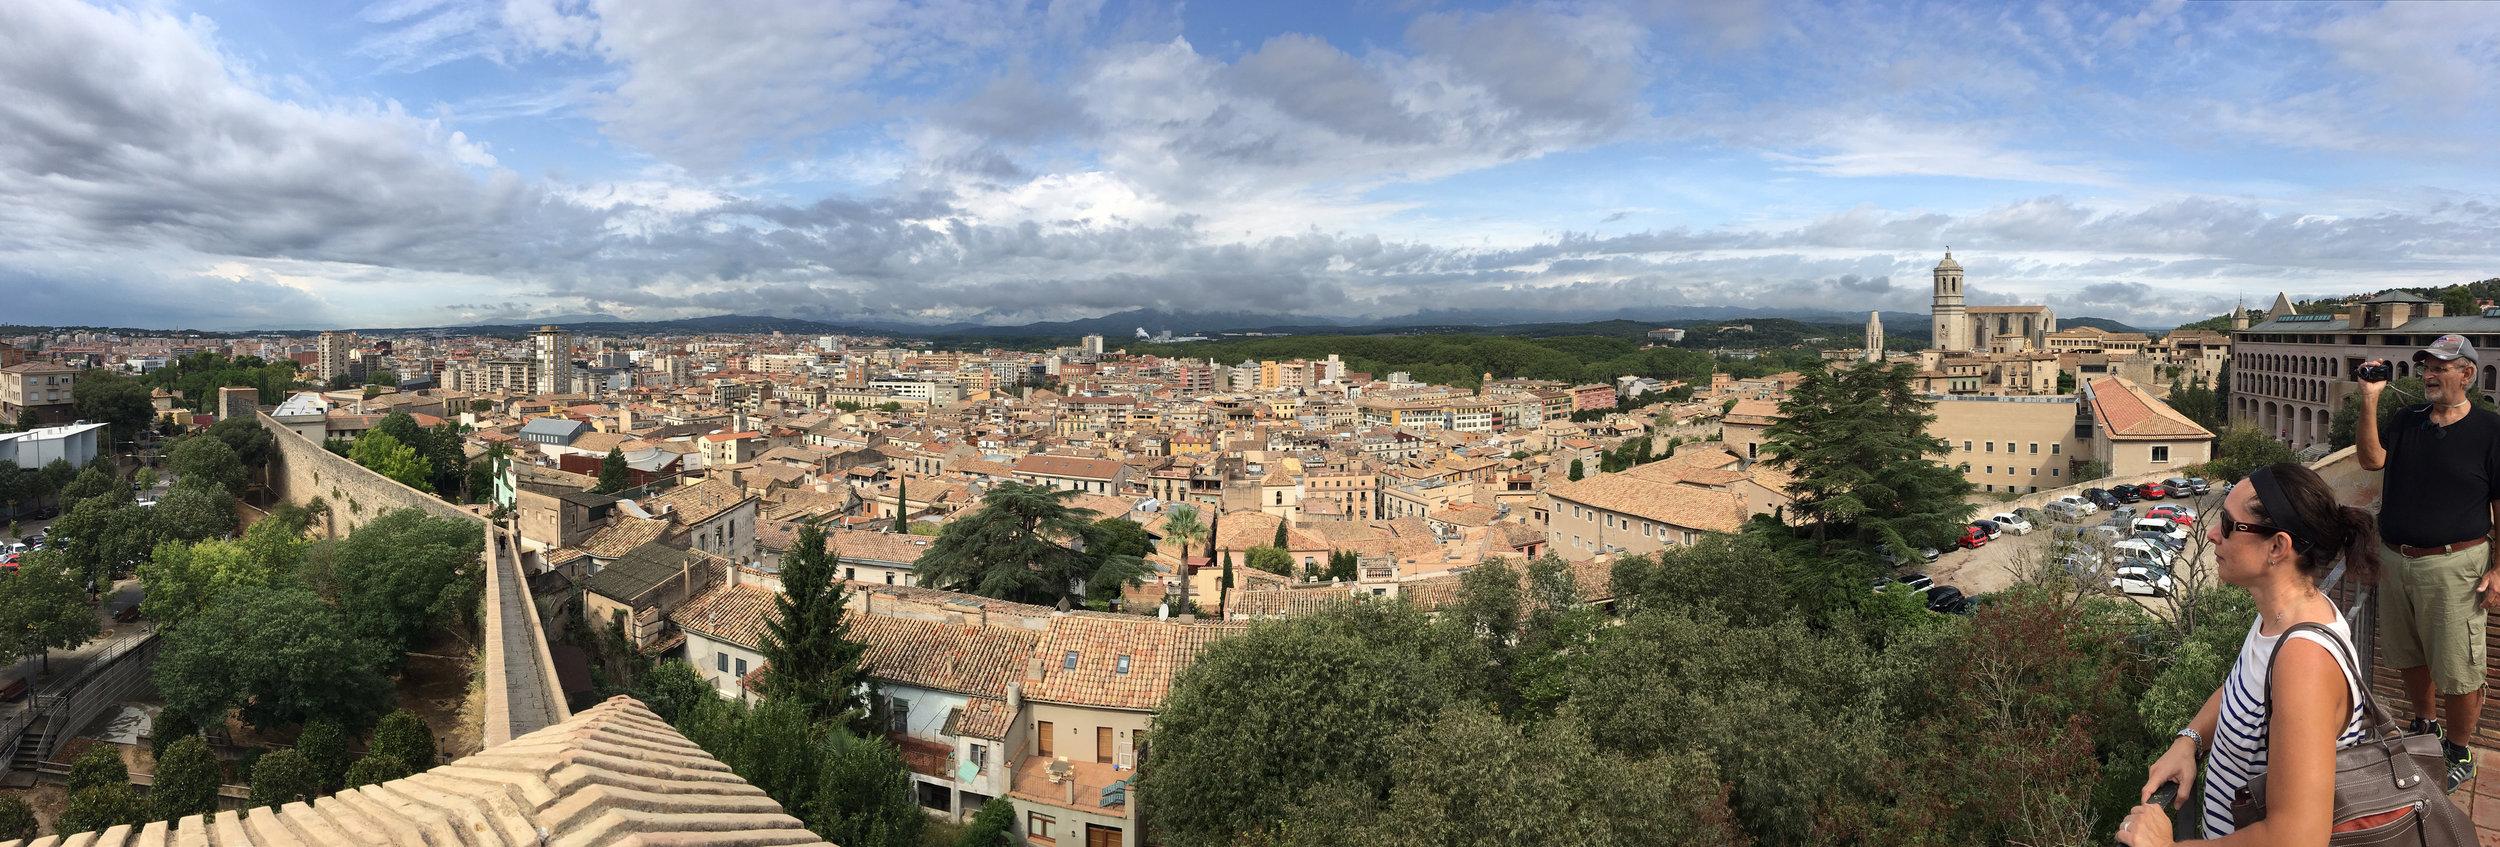 Girona panorama.